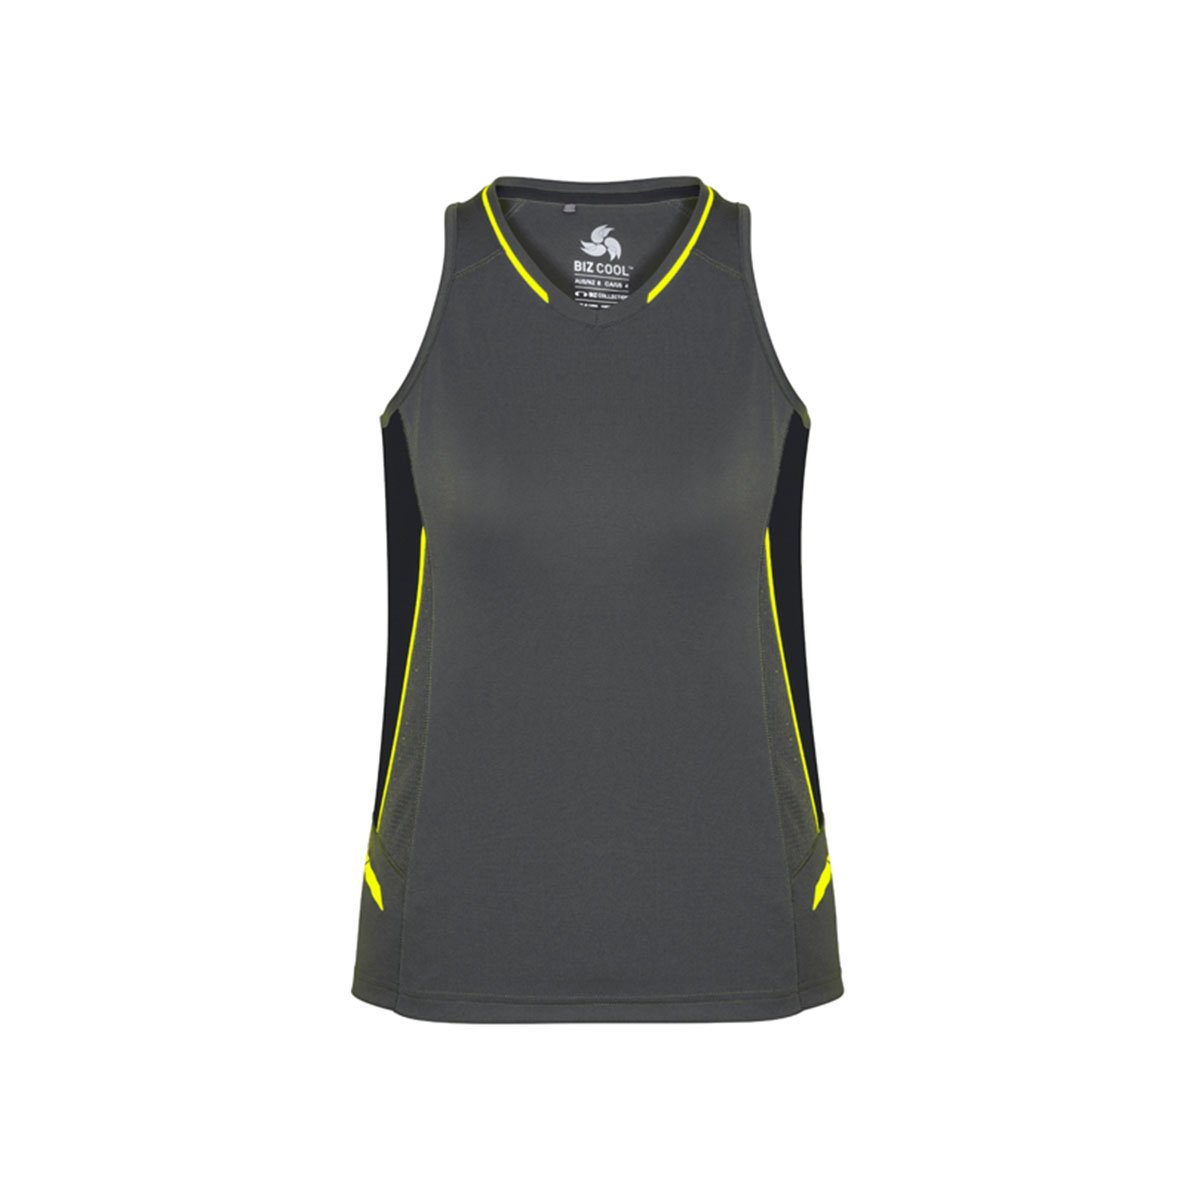 Ladies Renegade Singlet-Grey / Black / Fluoro Yellow